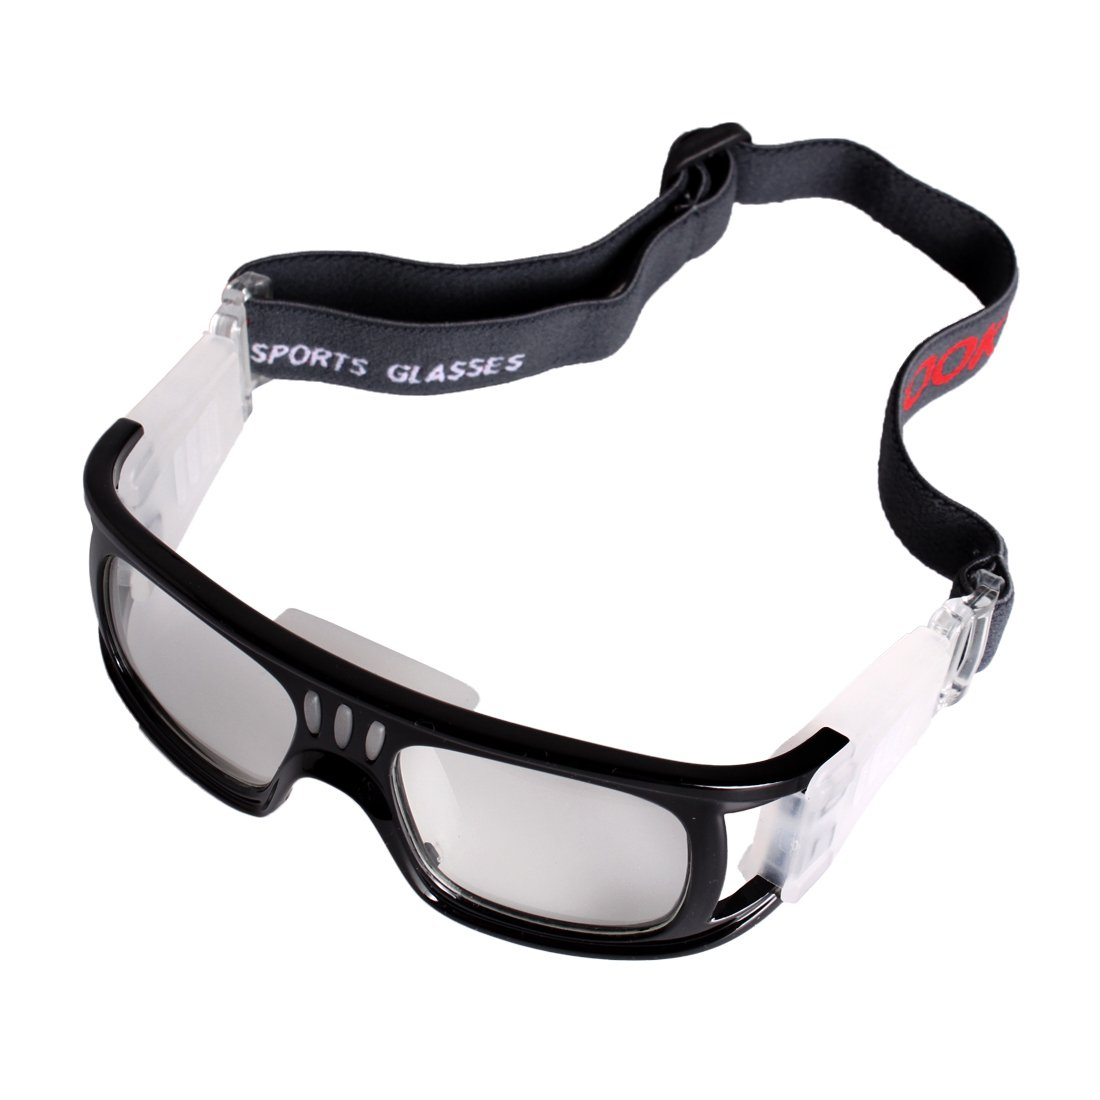 98e27c43115f Amazon.com   Andux Basketball Soccer Football Sports Protective Eyewear  Goggles Eye Safety Glasses LQYJ-01 (Black)   Sports   Outdoors